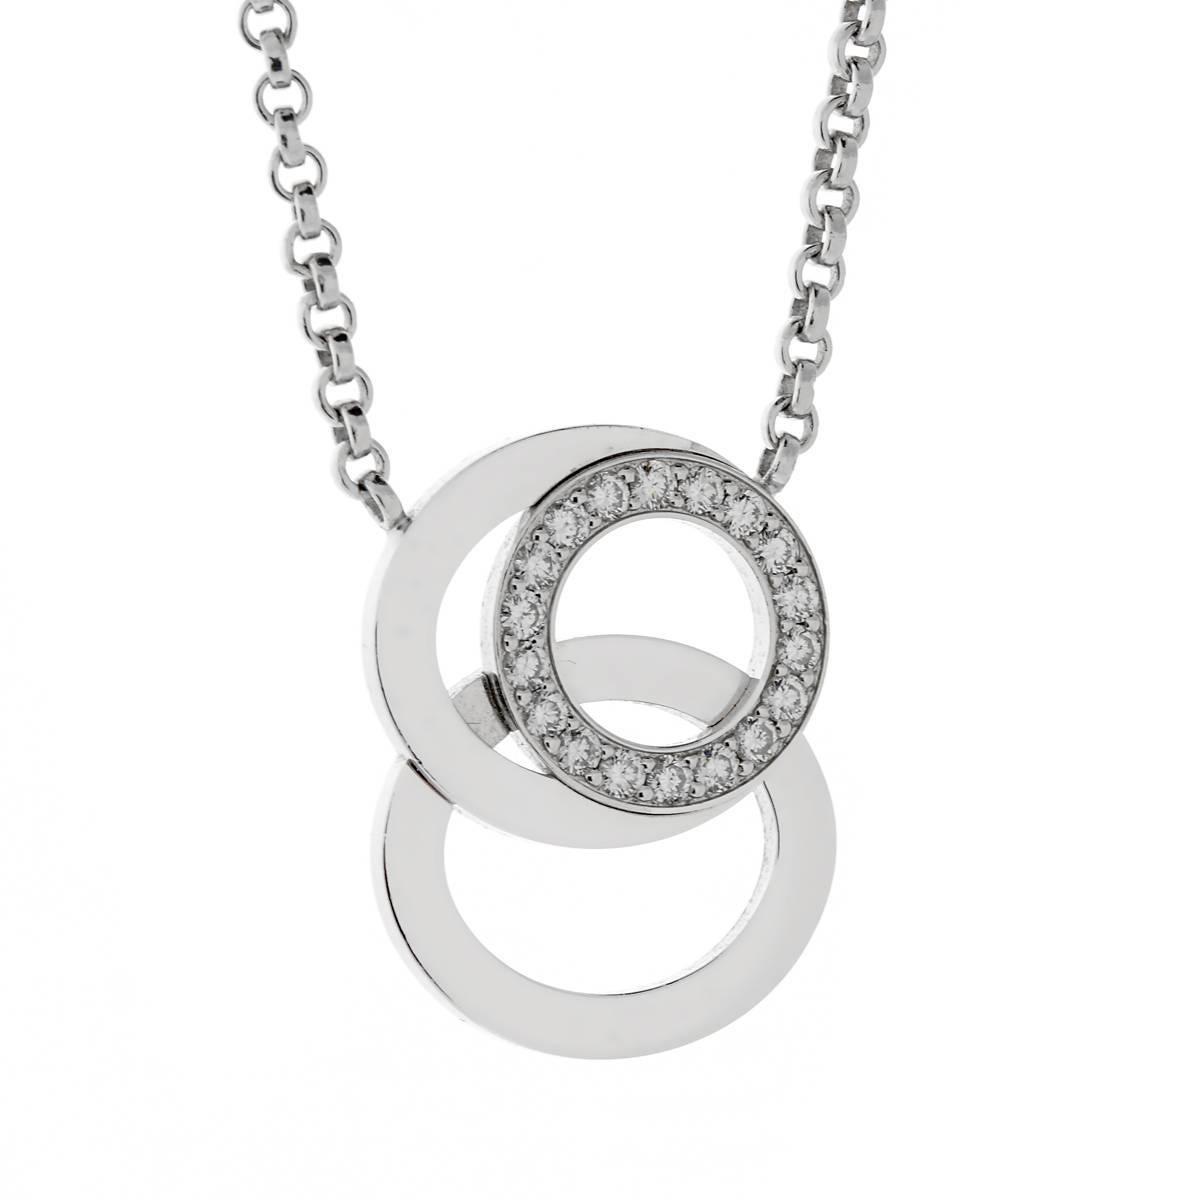 Audemars Piguet Millenary Diamond White Gold Necklace